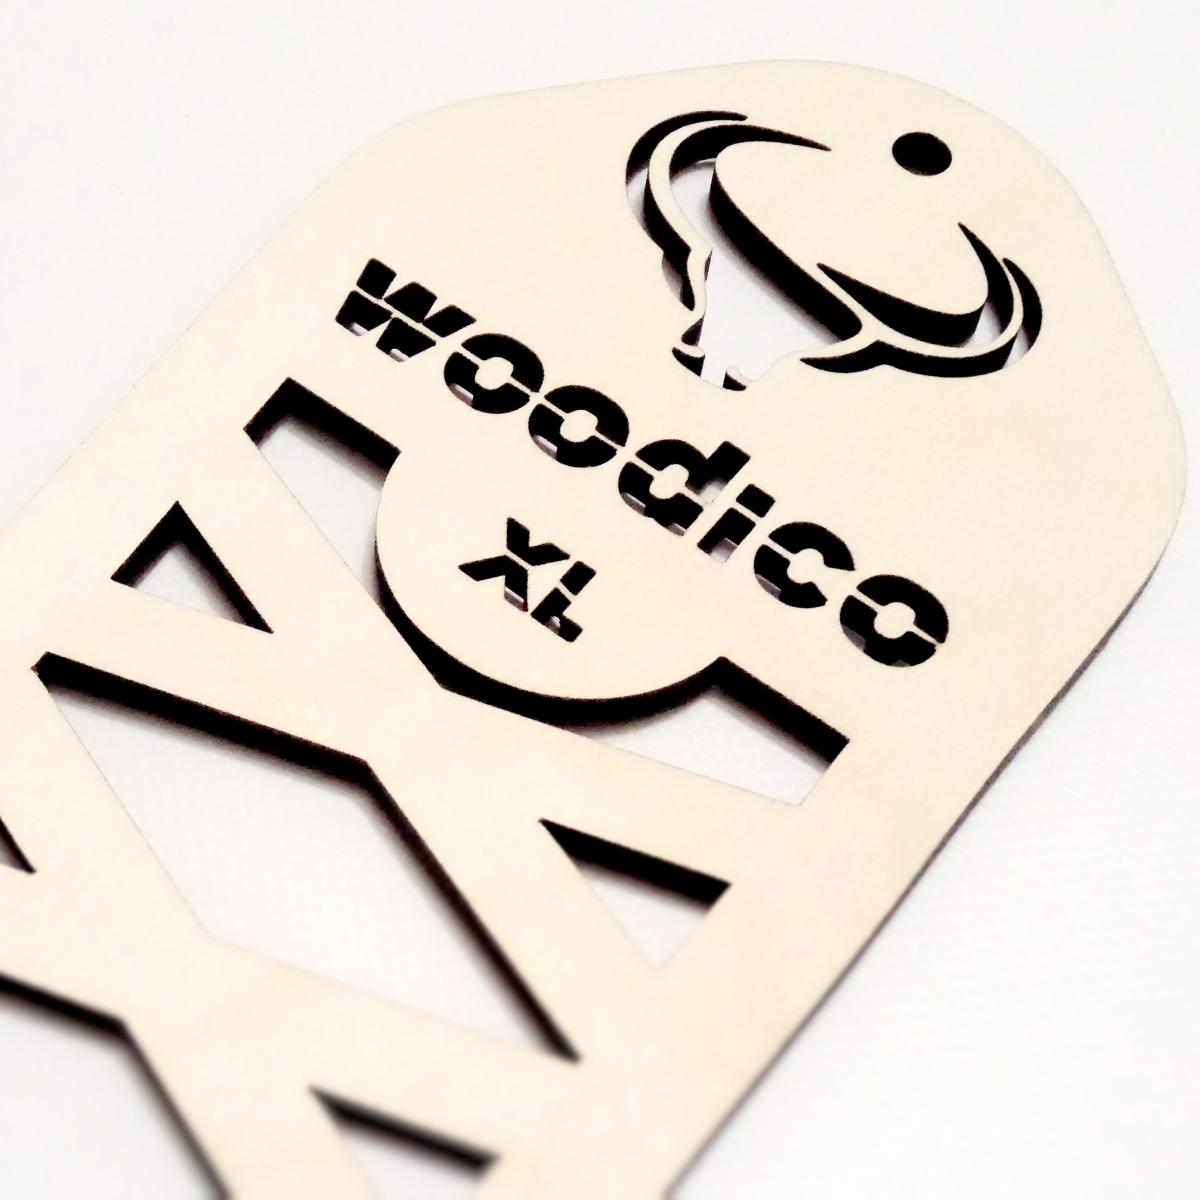 woodico.pro wooden sock blockers taurus 26 1200x1200 - Wooden sock blockers / Taurus